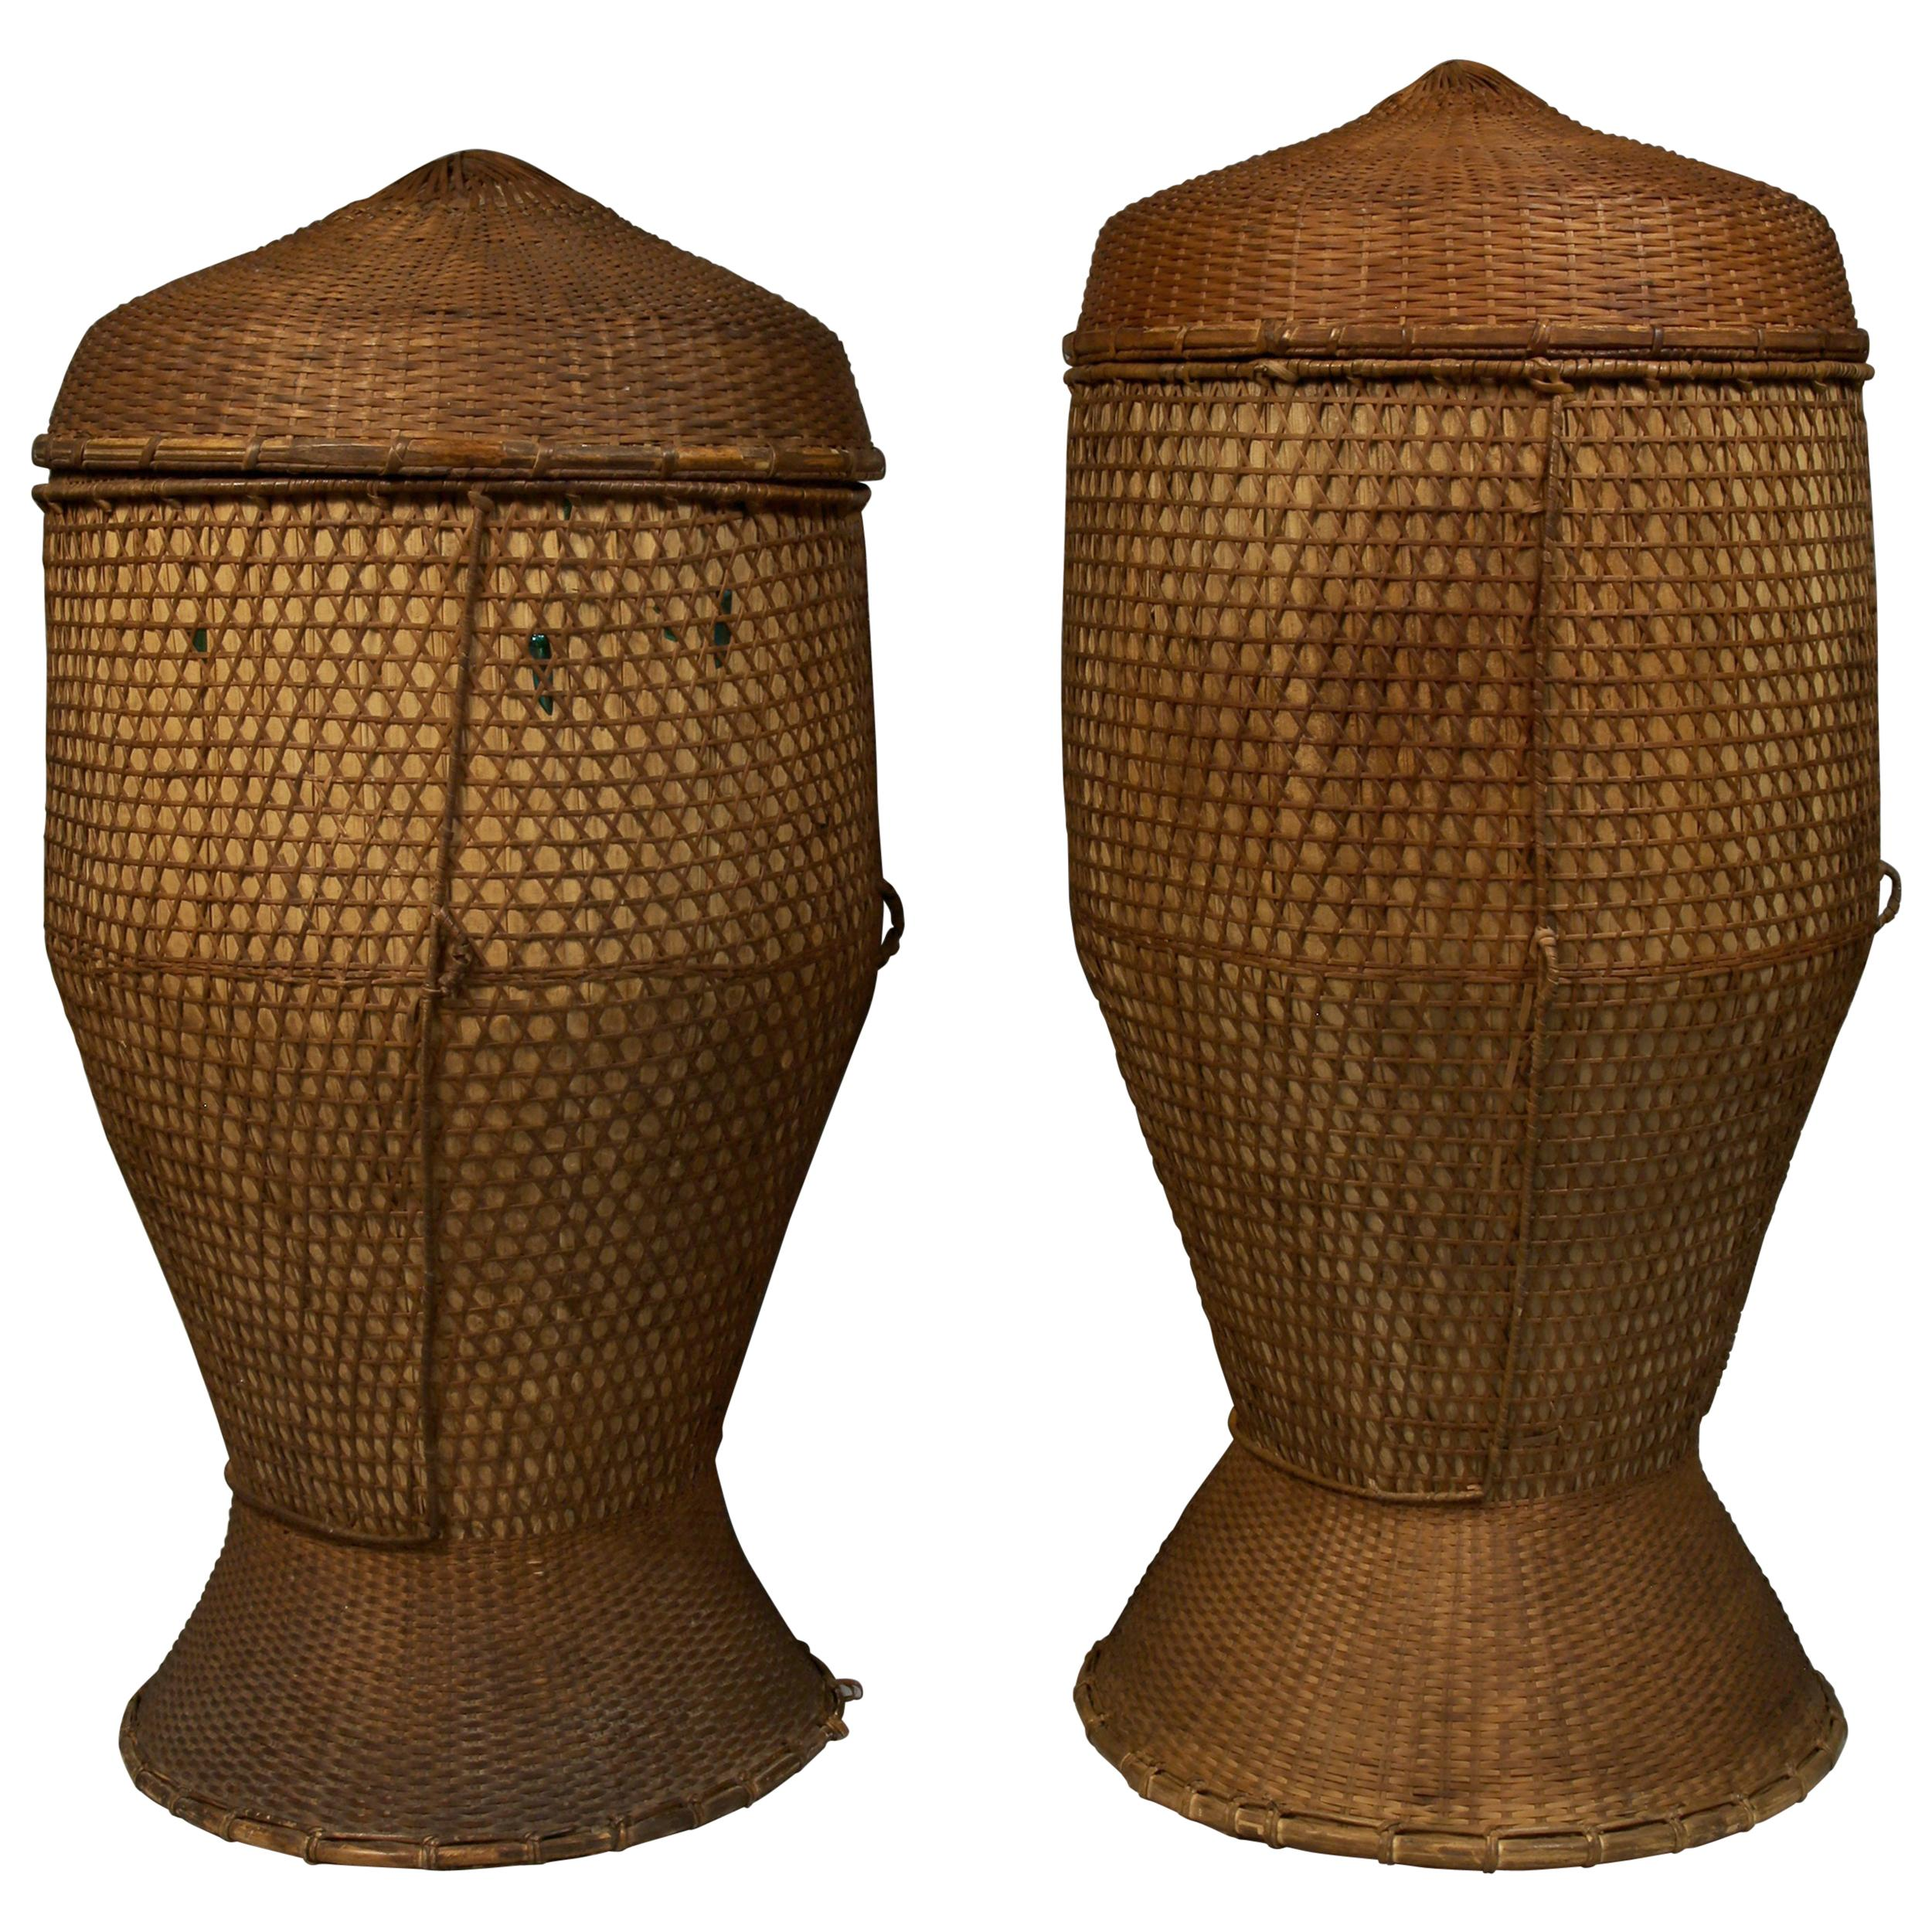 Pair of Large Vintage Grain Storage Baskets, Thailand, Mid-20th Century